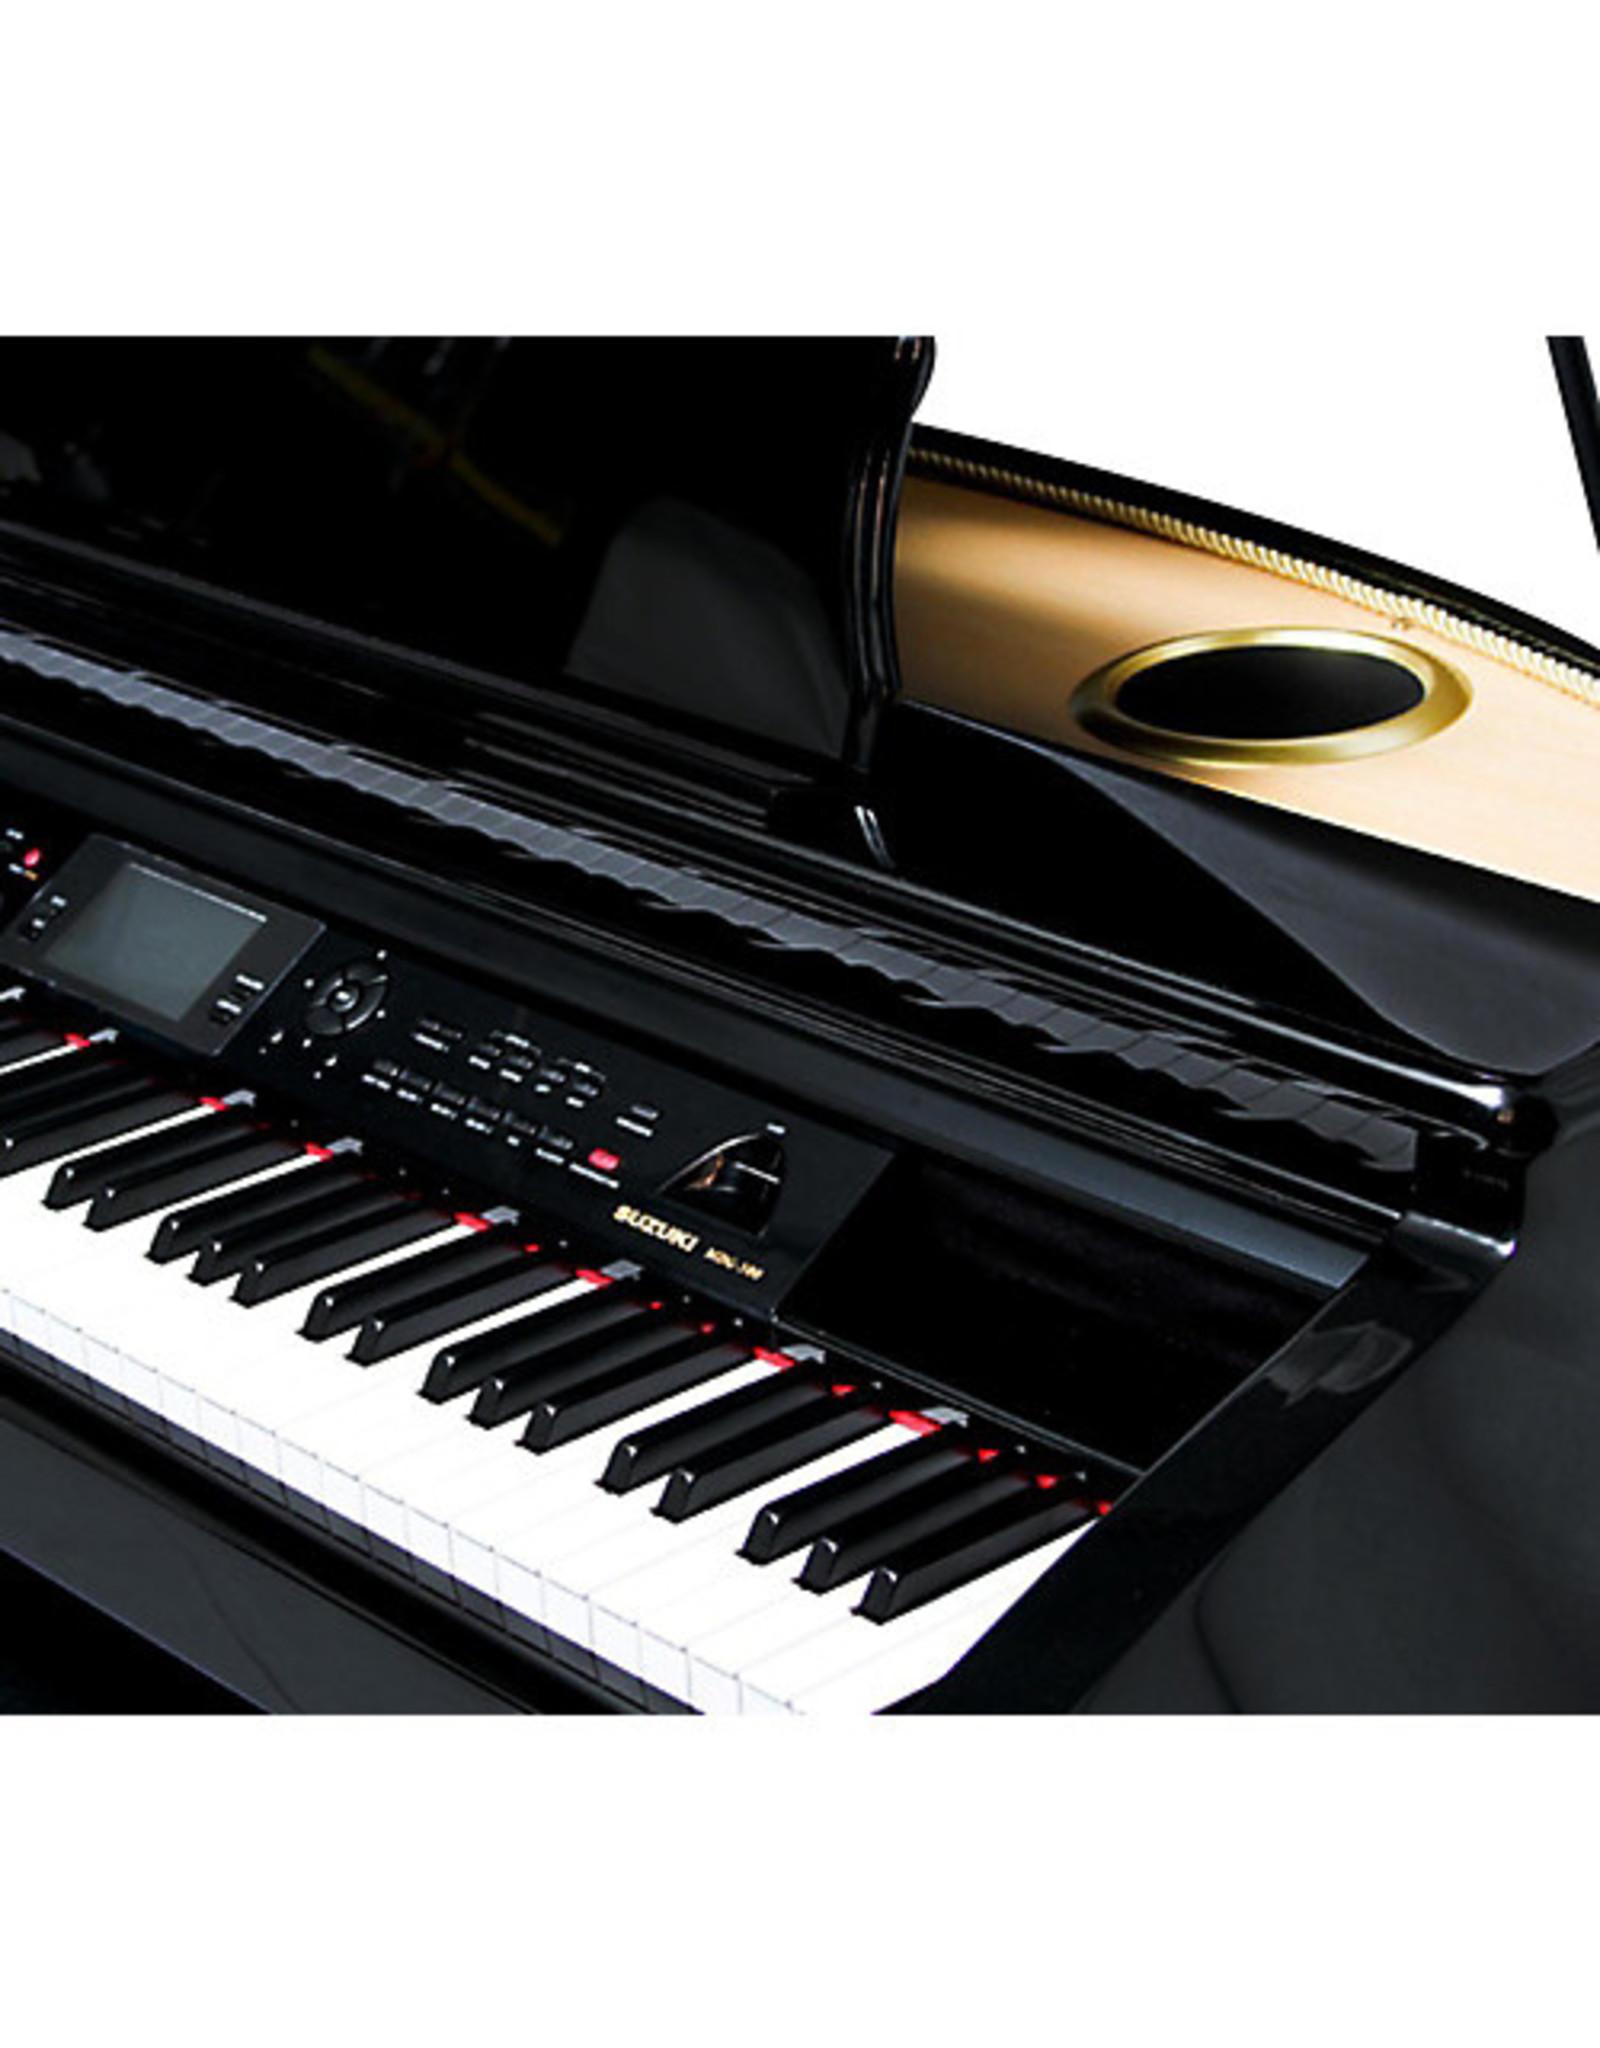 Suzuki Suzuki MDG-300 Black Micro Grand Digital Piano